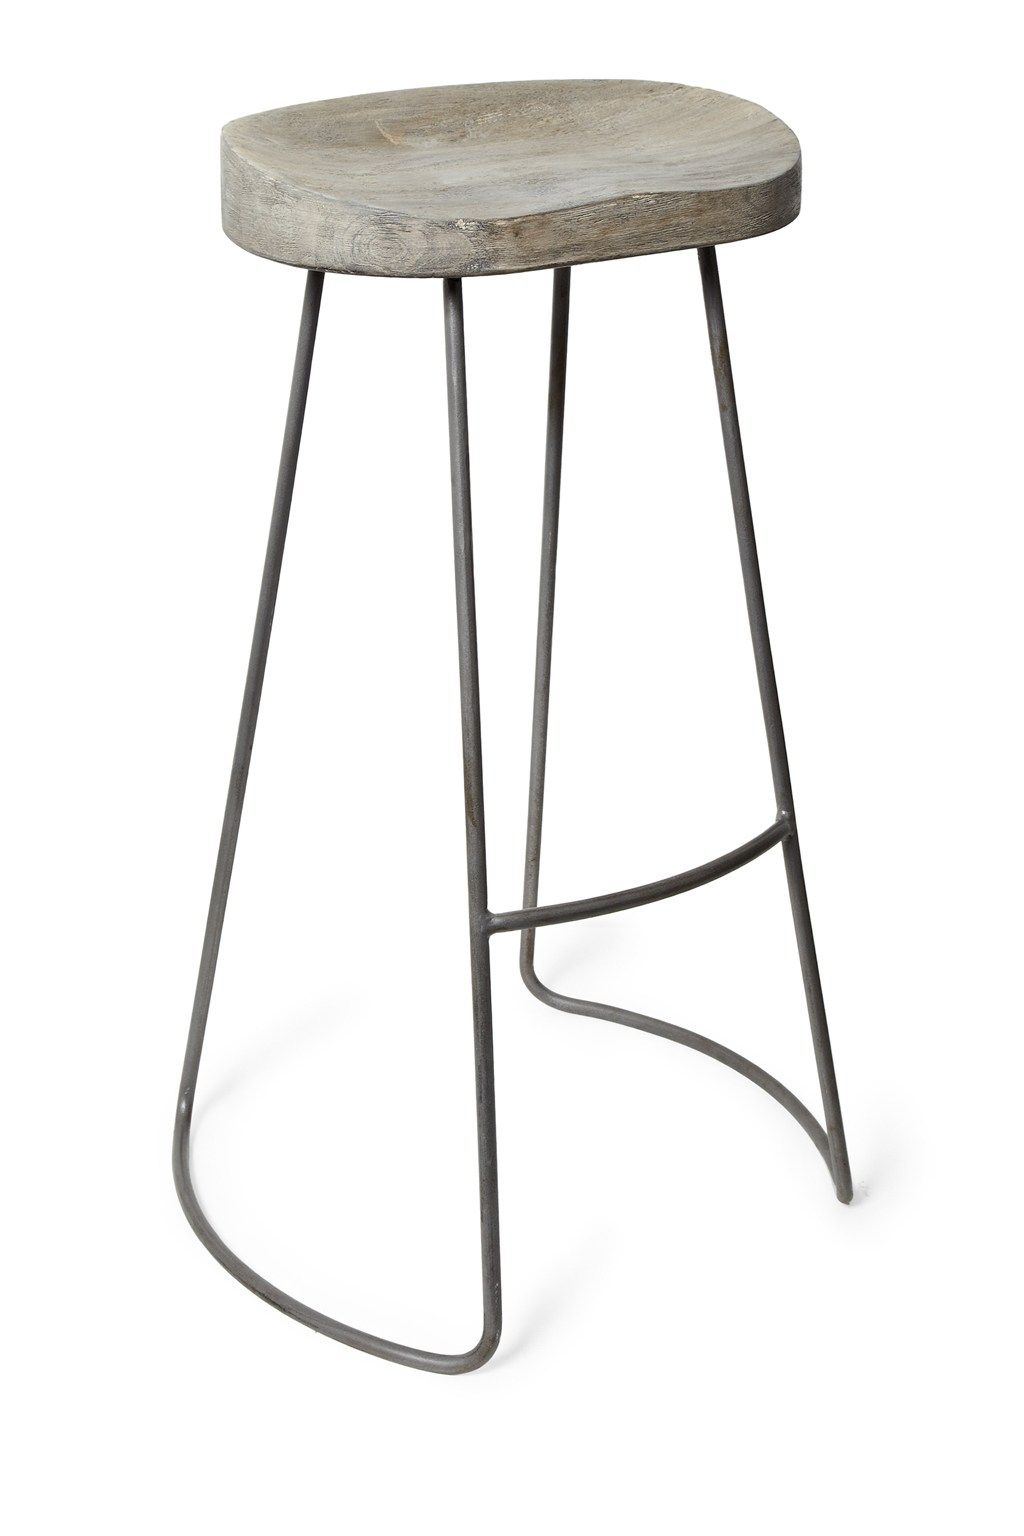 Roger Large Bar Stool Wooden bar stools, Bar stool